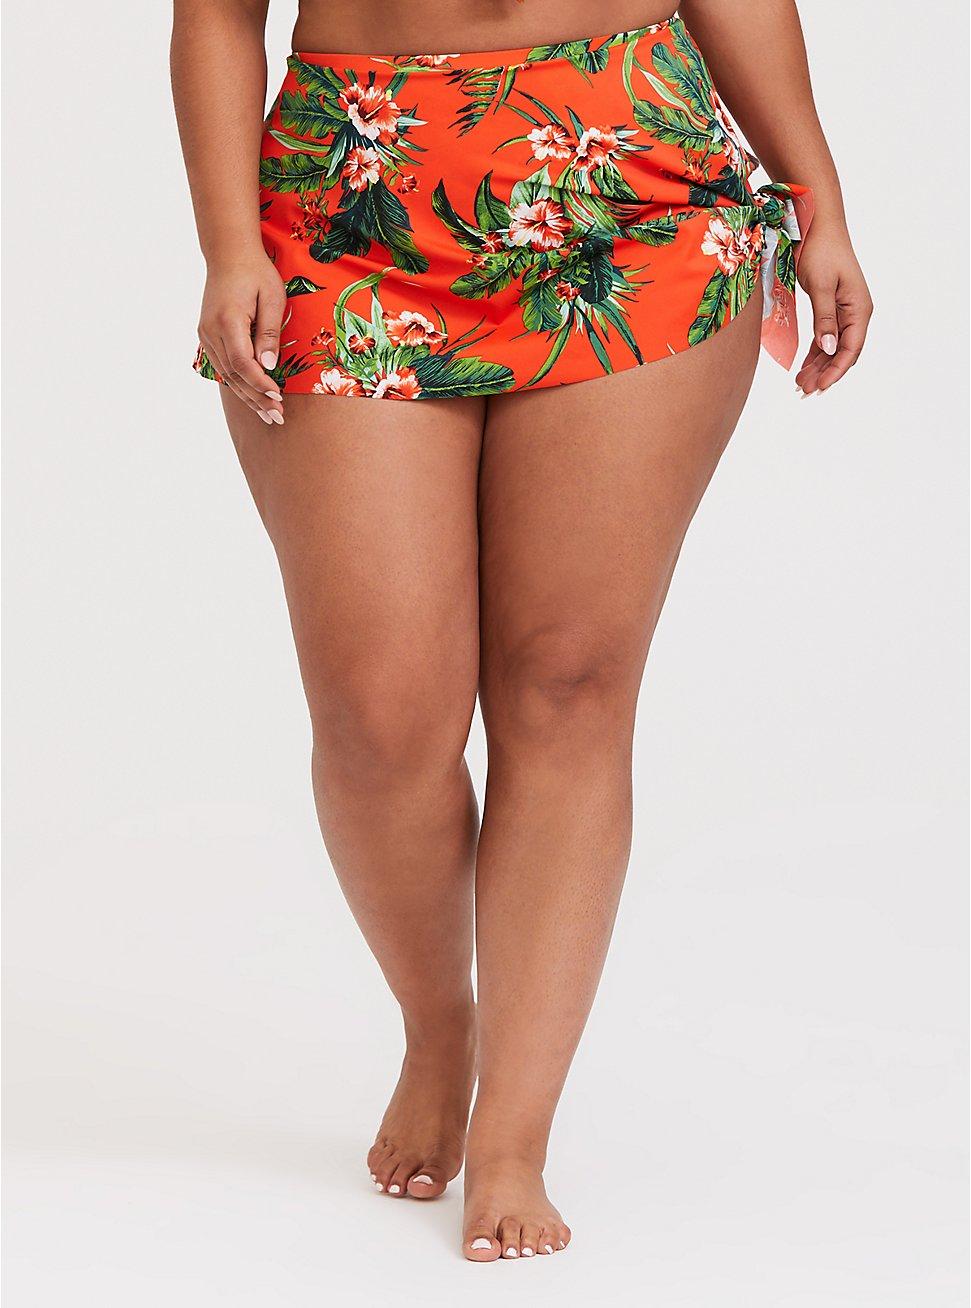 Orange Tropical High Waist Asymmetrical Swim Skirt, MULTI, hi-res